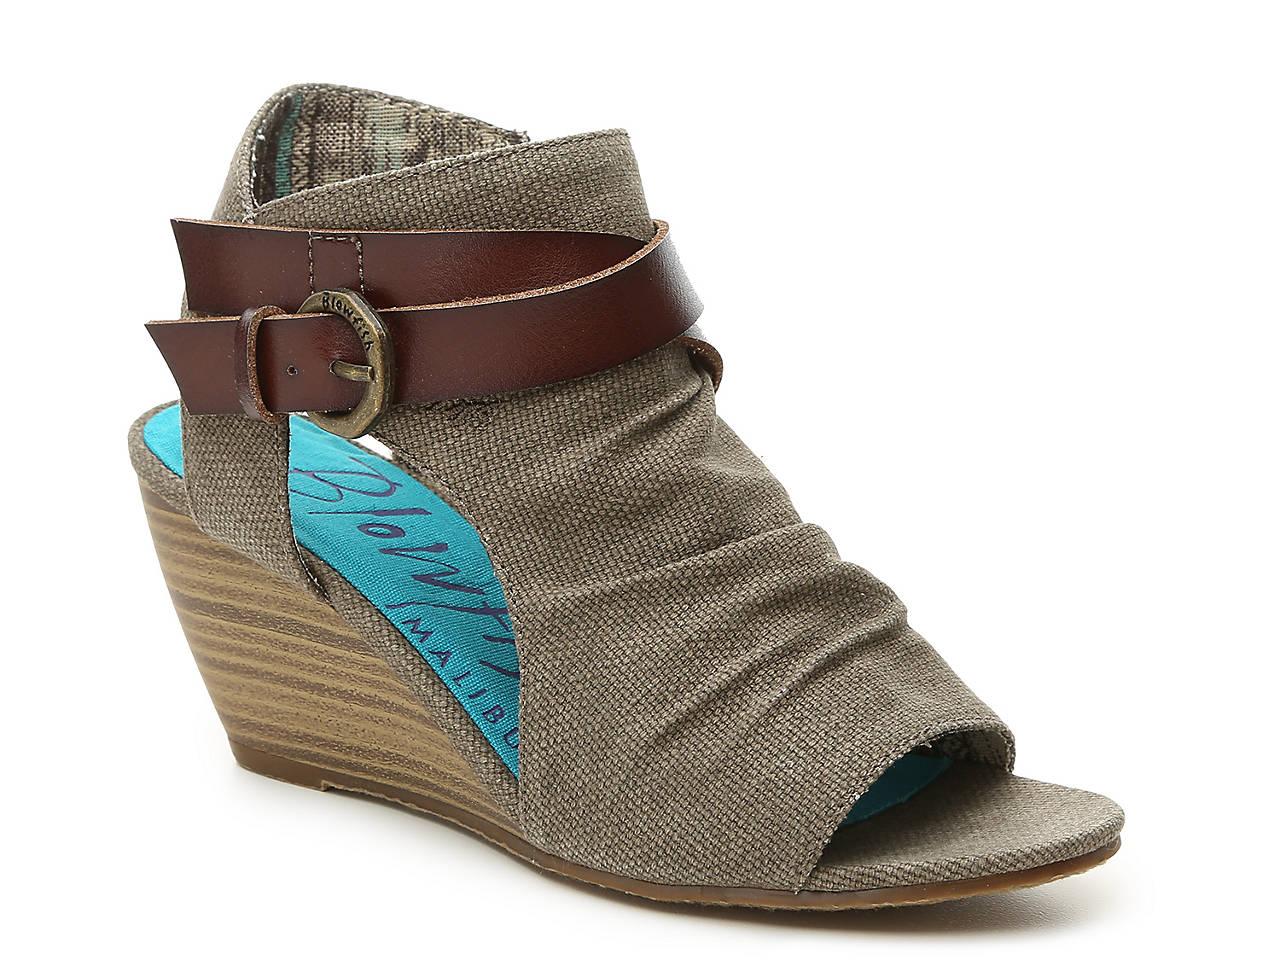 59c6ca824 Blowfish Budha Wedge Sandal Women s Shoes